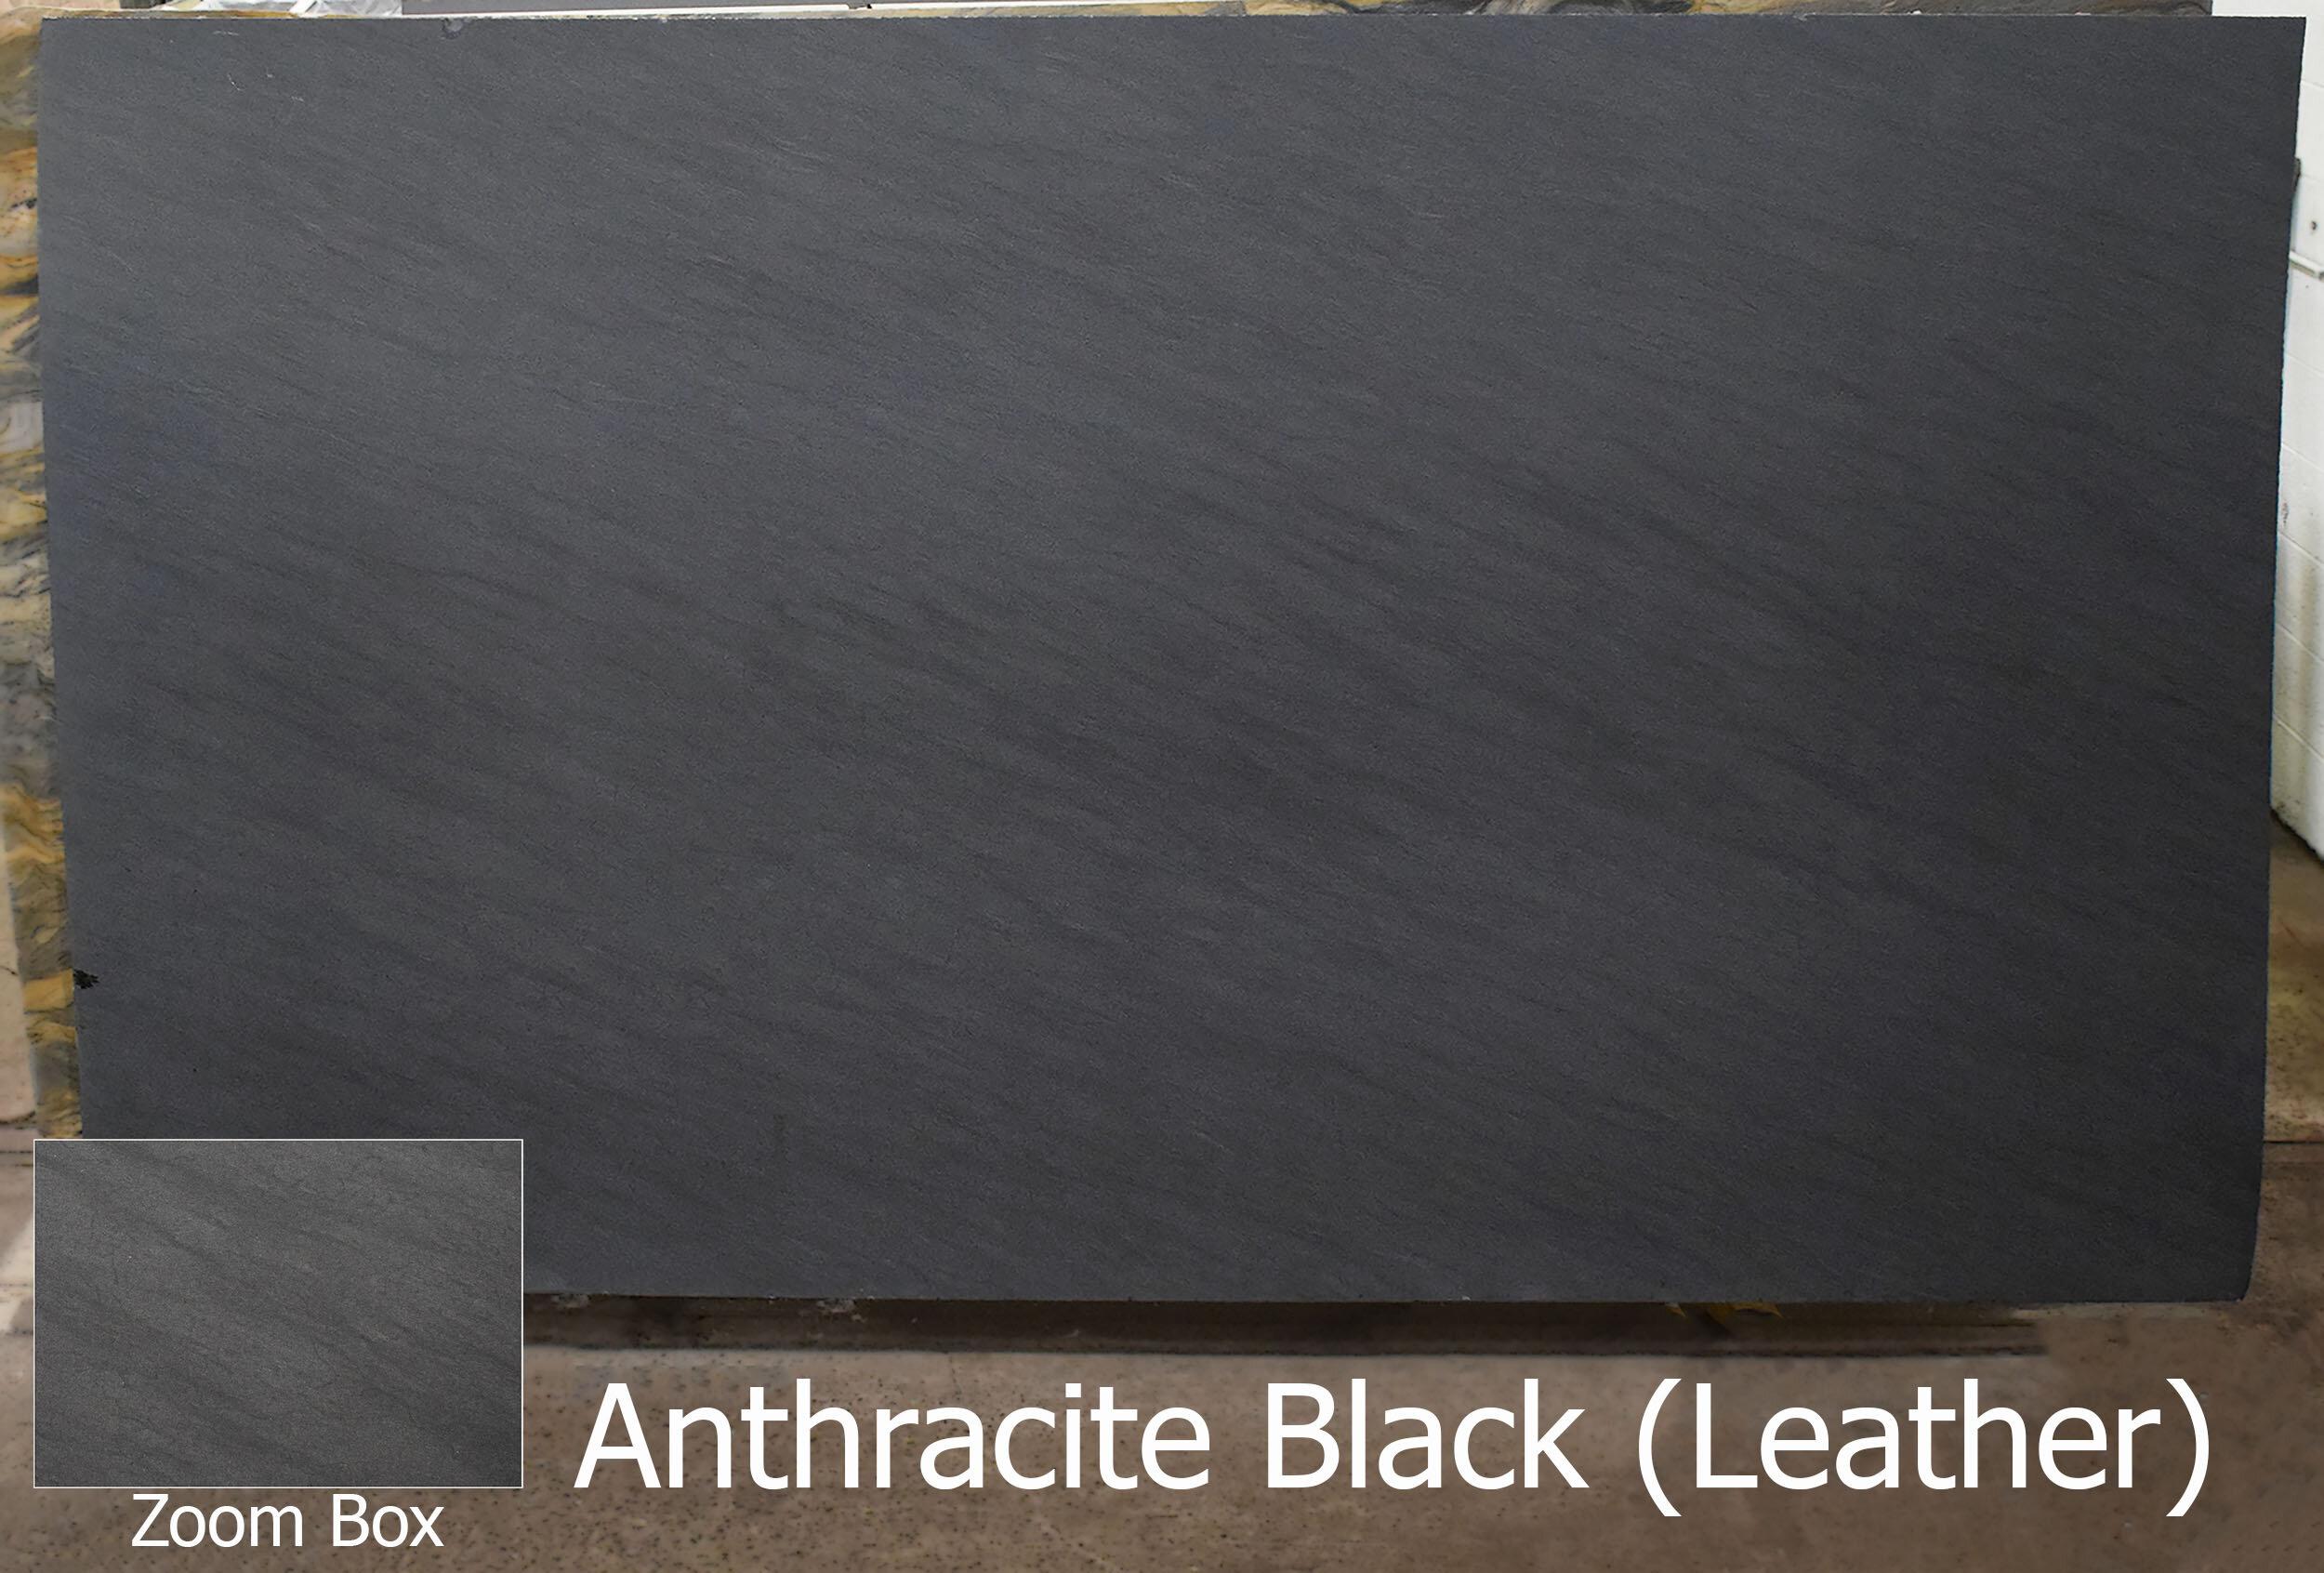 ANTHRACITE BLACK (LEATHER)